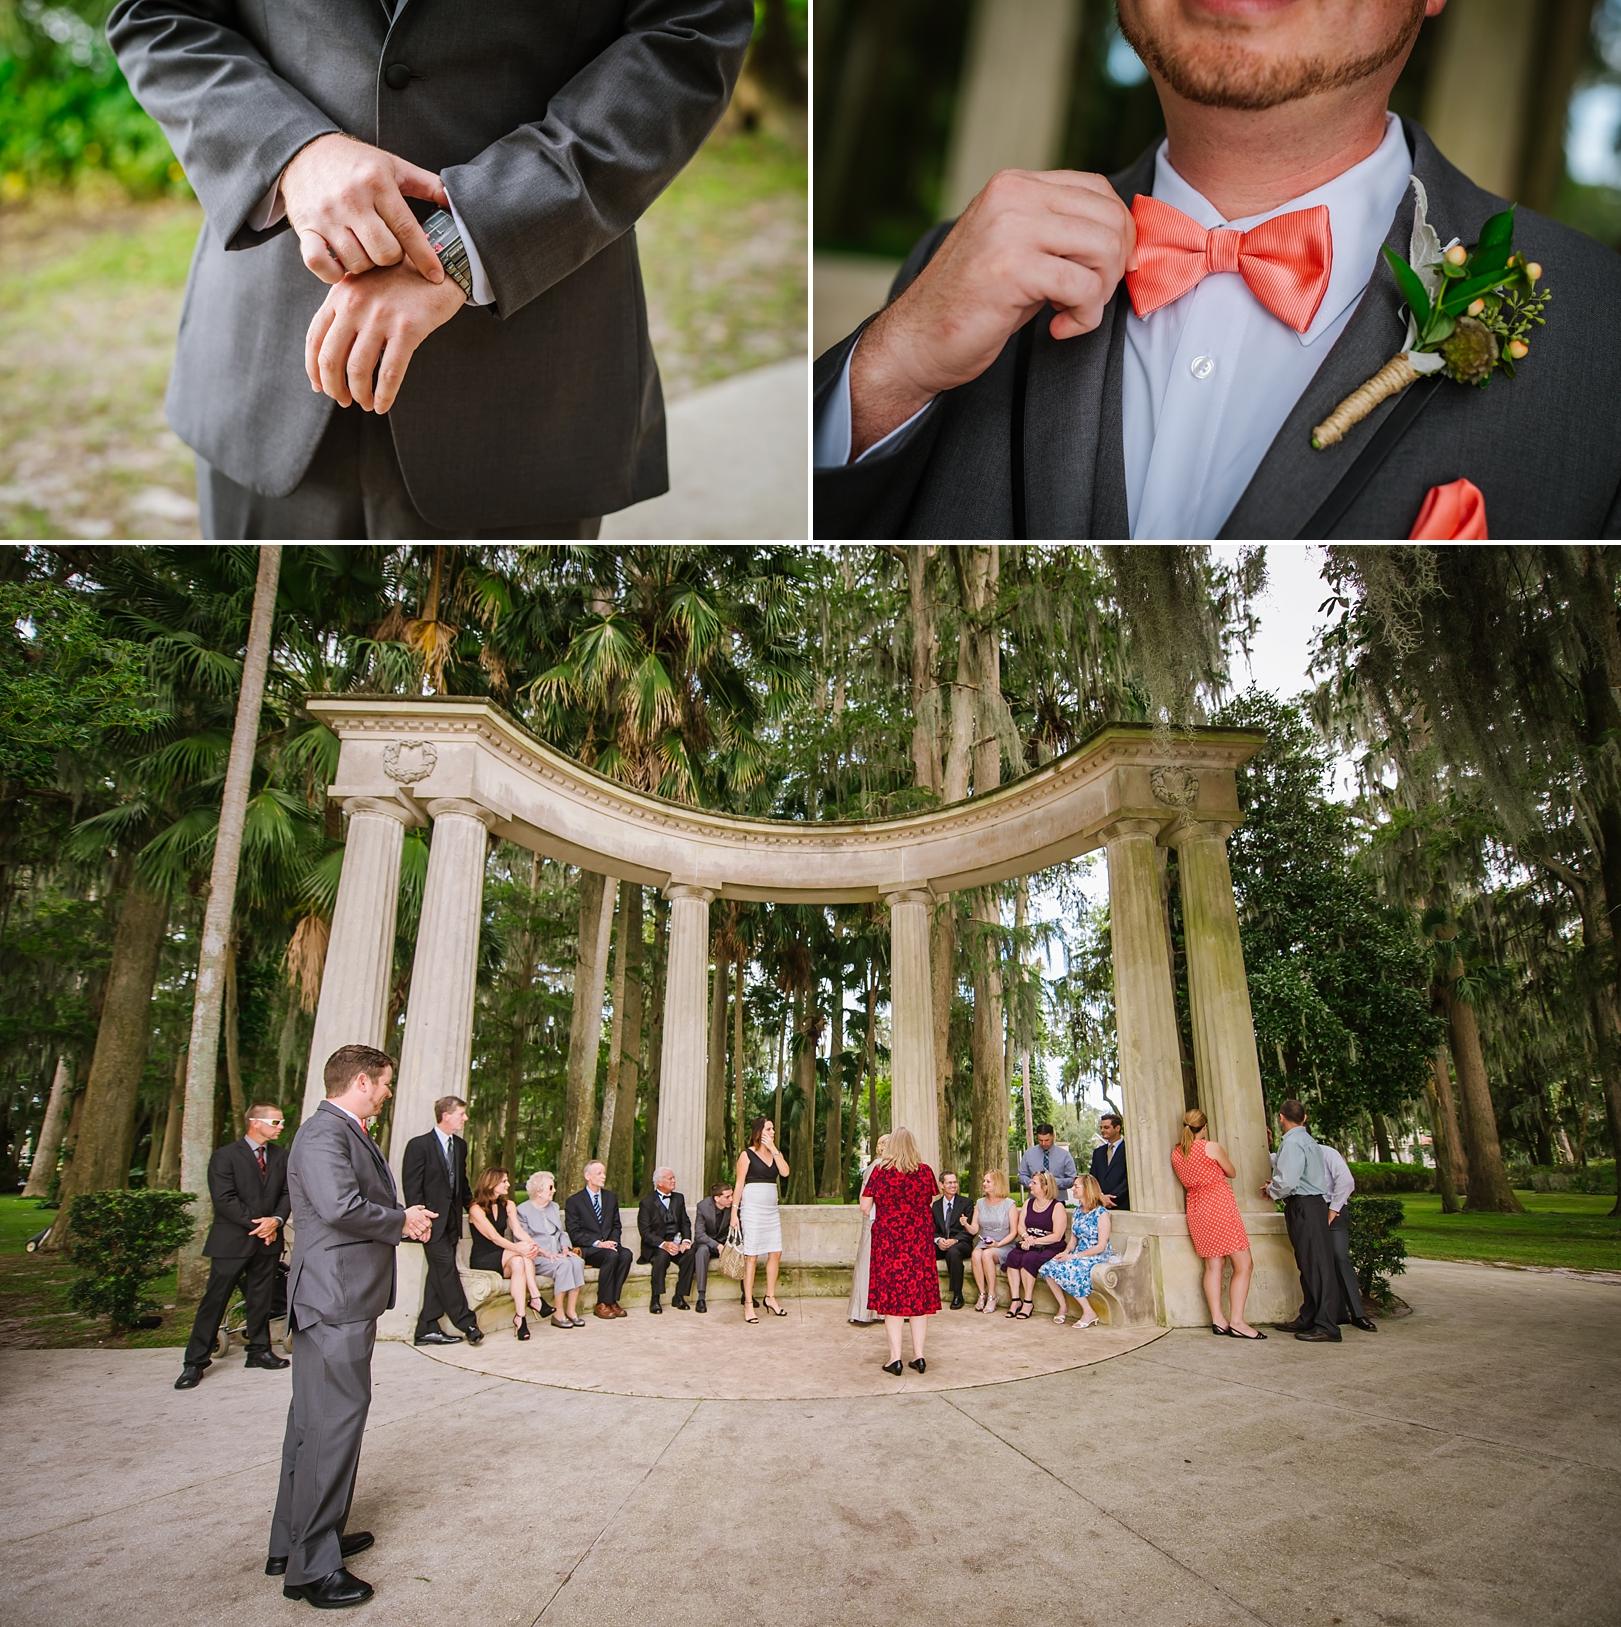 kraft-azalea-gardens-stylish-elopment-wedding-photography_0010.jpg